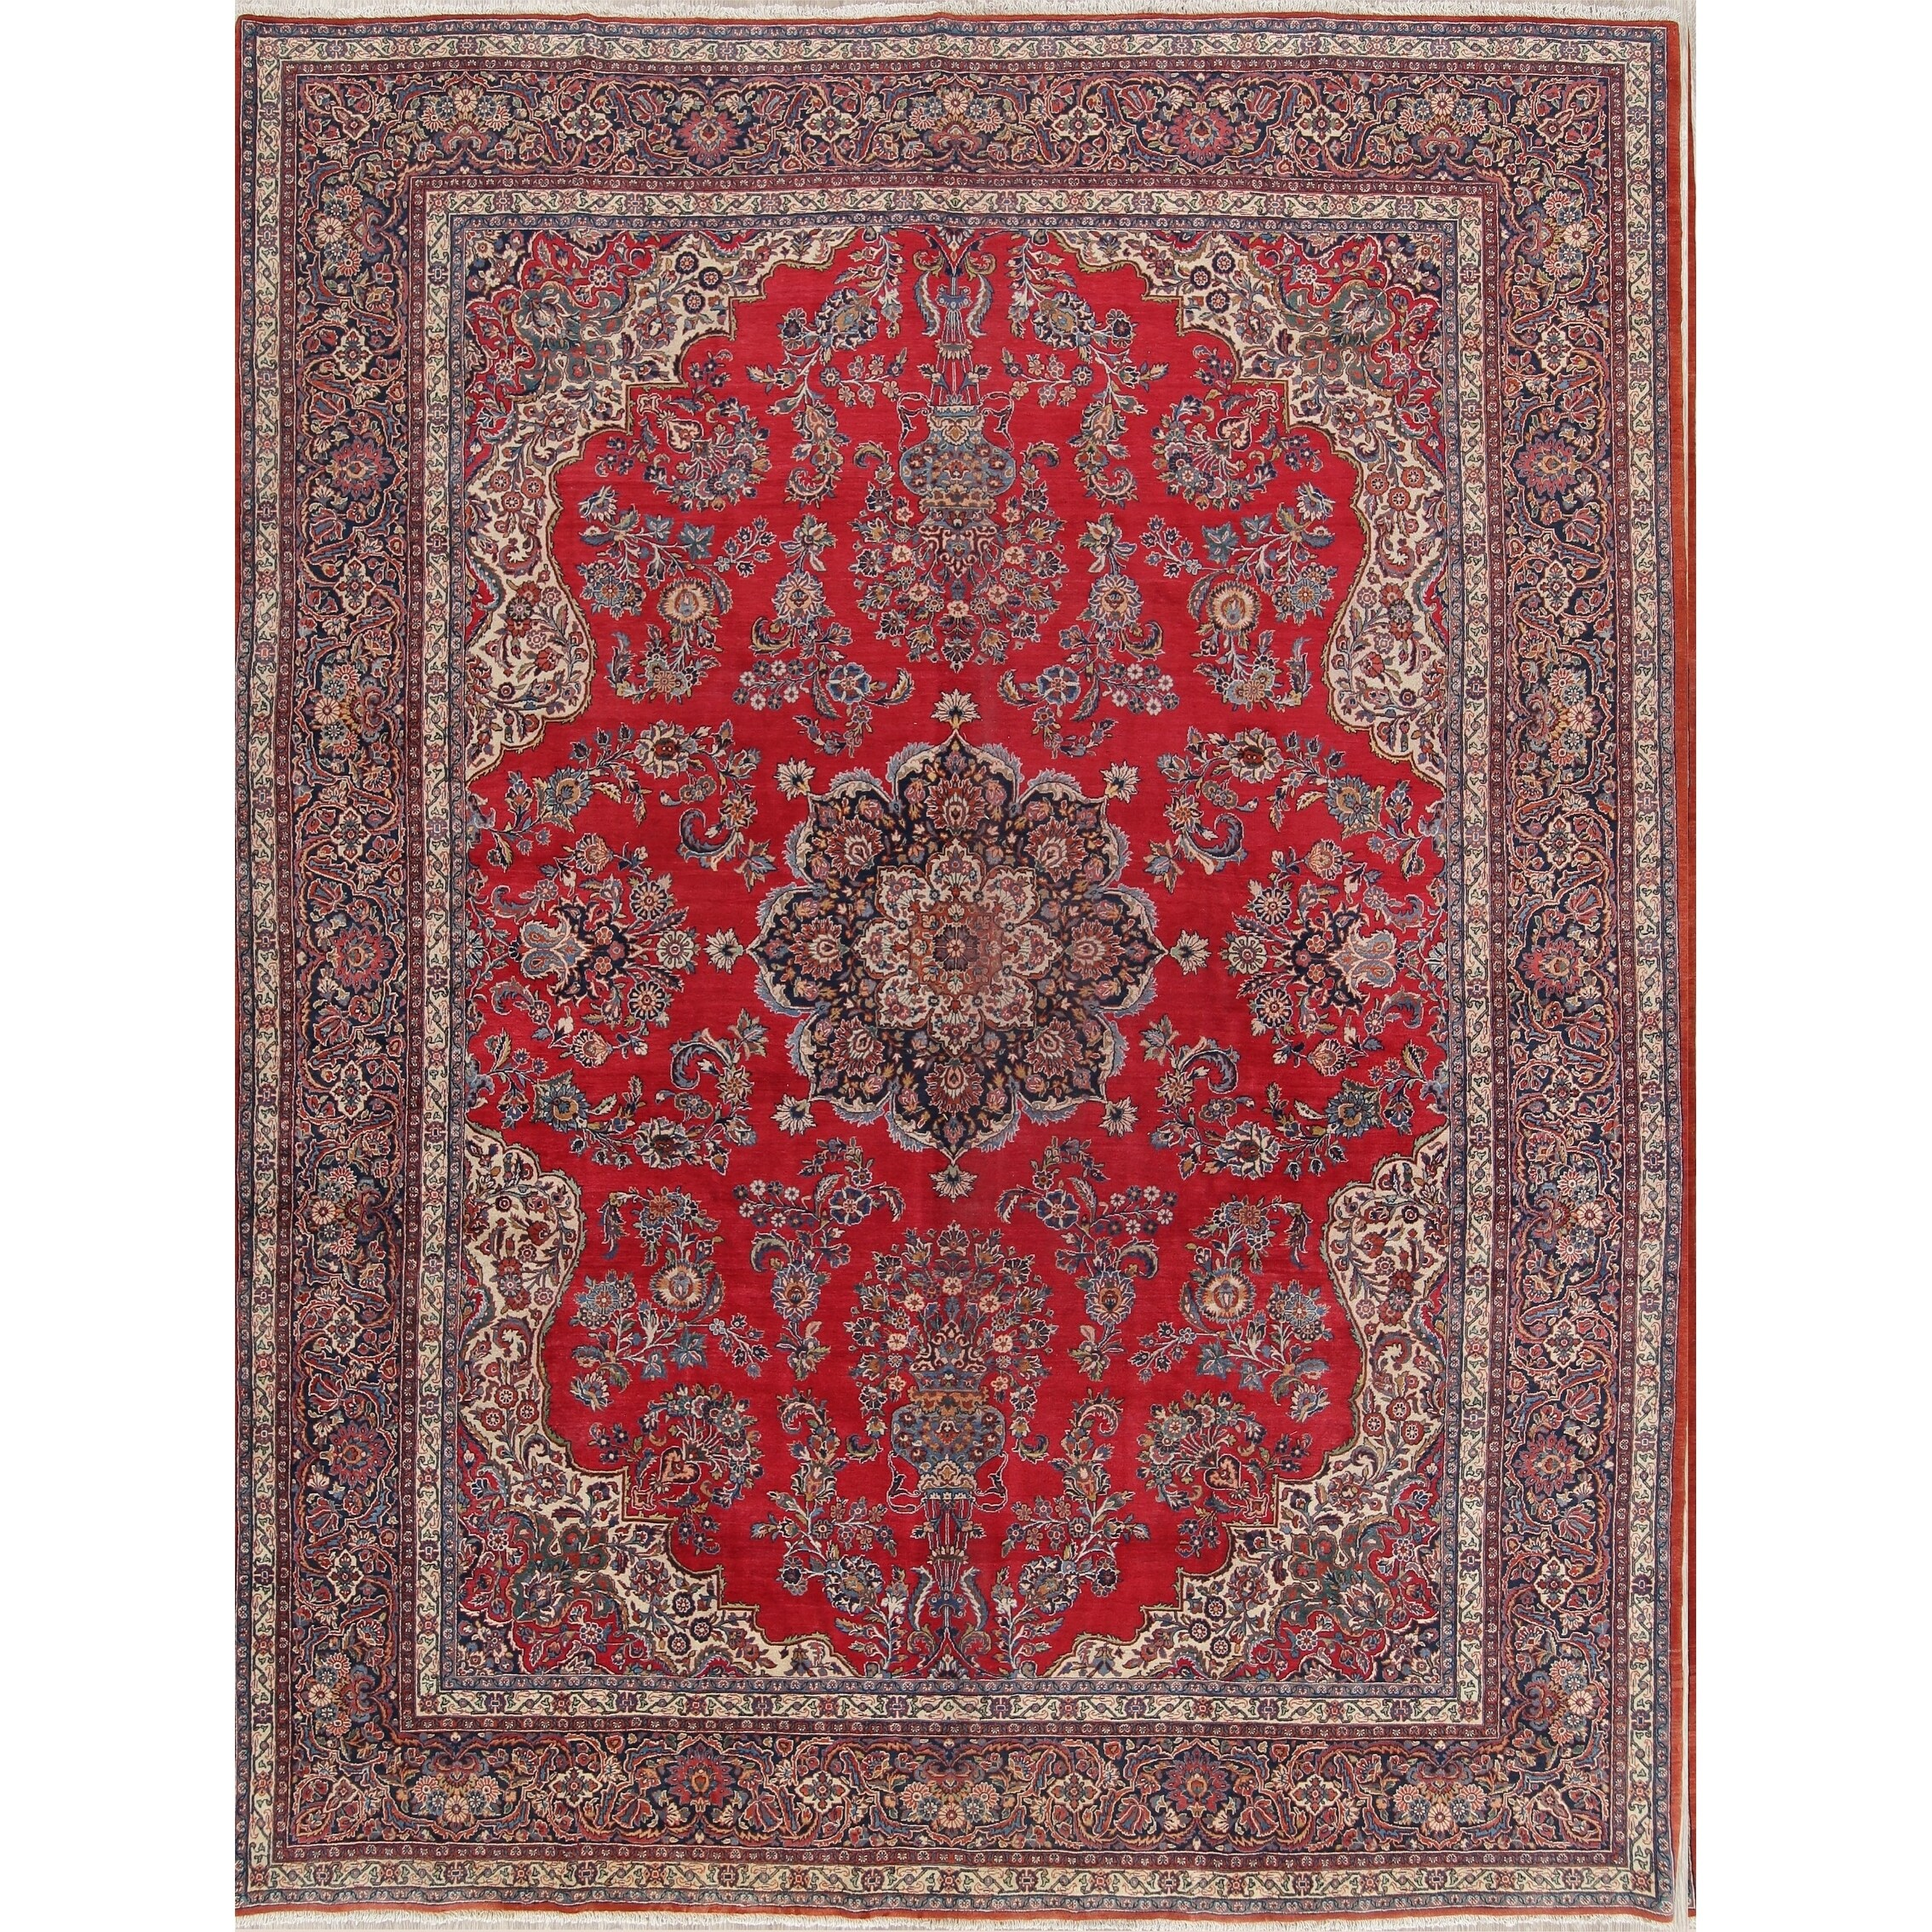 Antique Handmade Wool Floral Kork Dabir Persian Carpet Area Rug 13 8 X 10 1